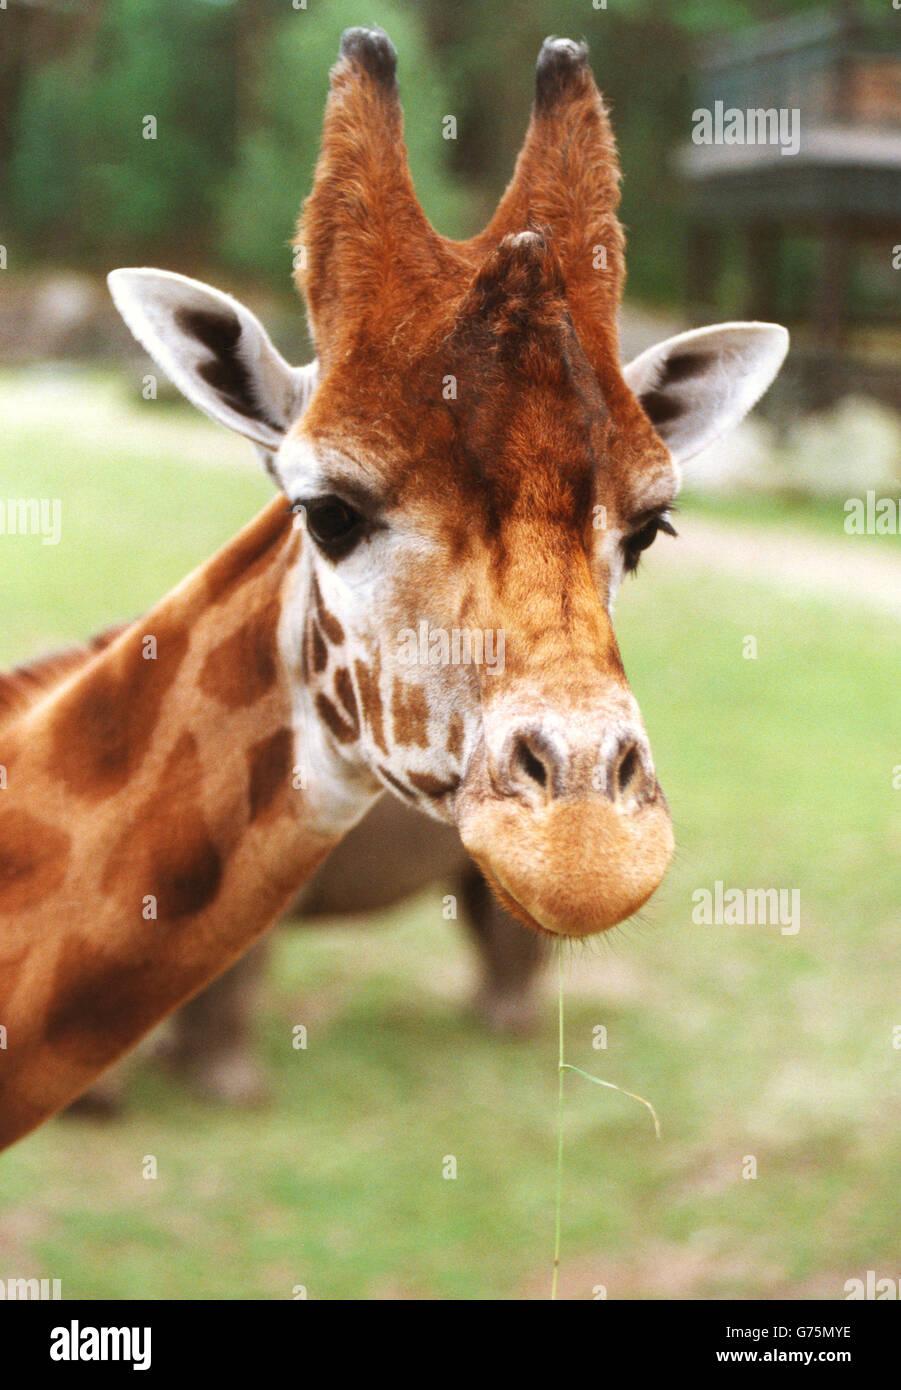 Jirafa en el Zoo. Foto de stock